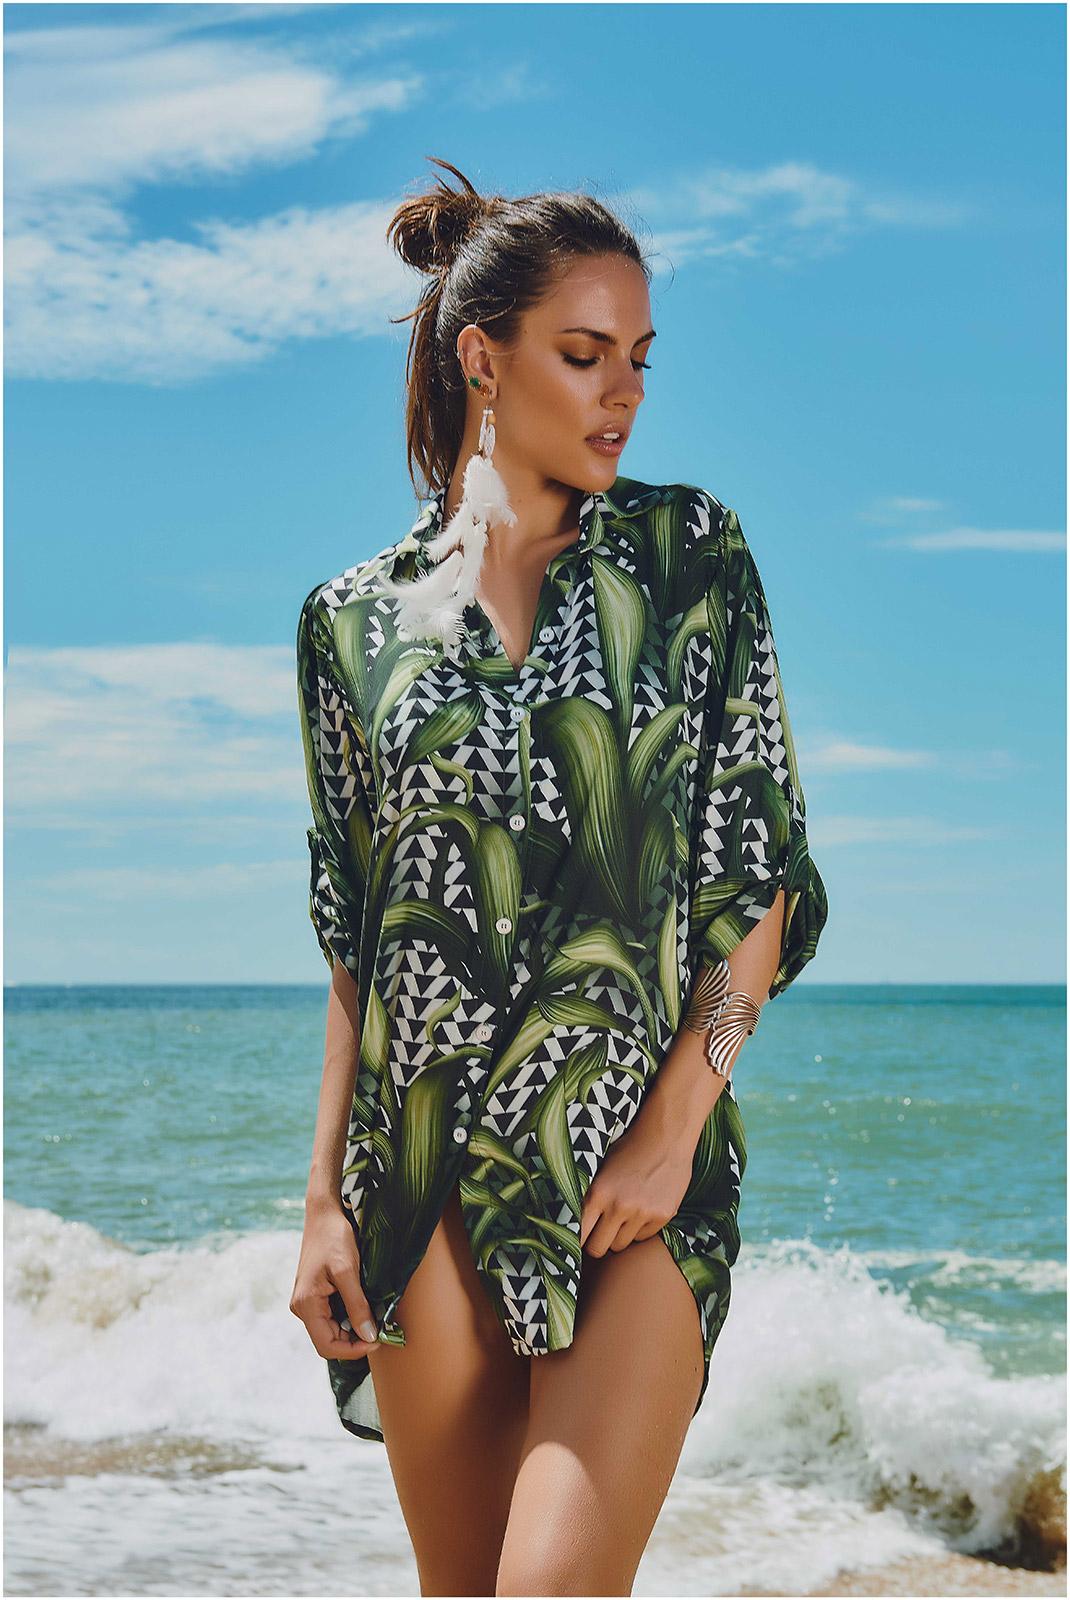 Shirt kleid mit geometrischem pflanzenmuster dunas palm for Palm springs tattoo shops